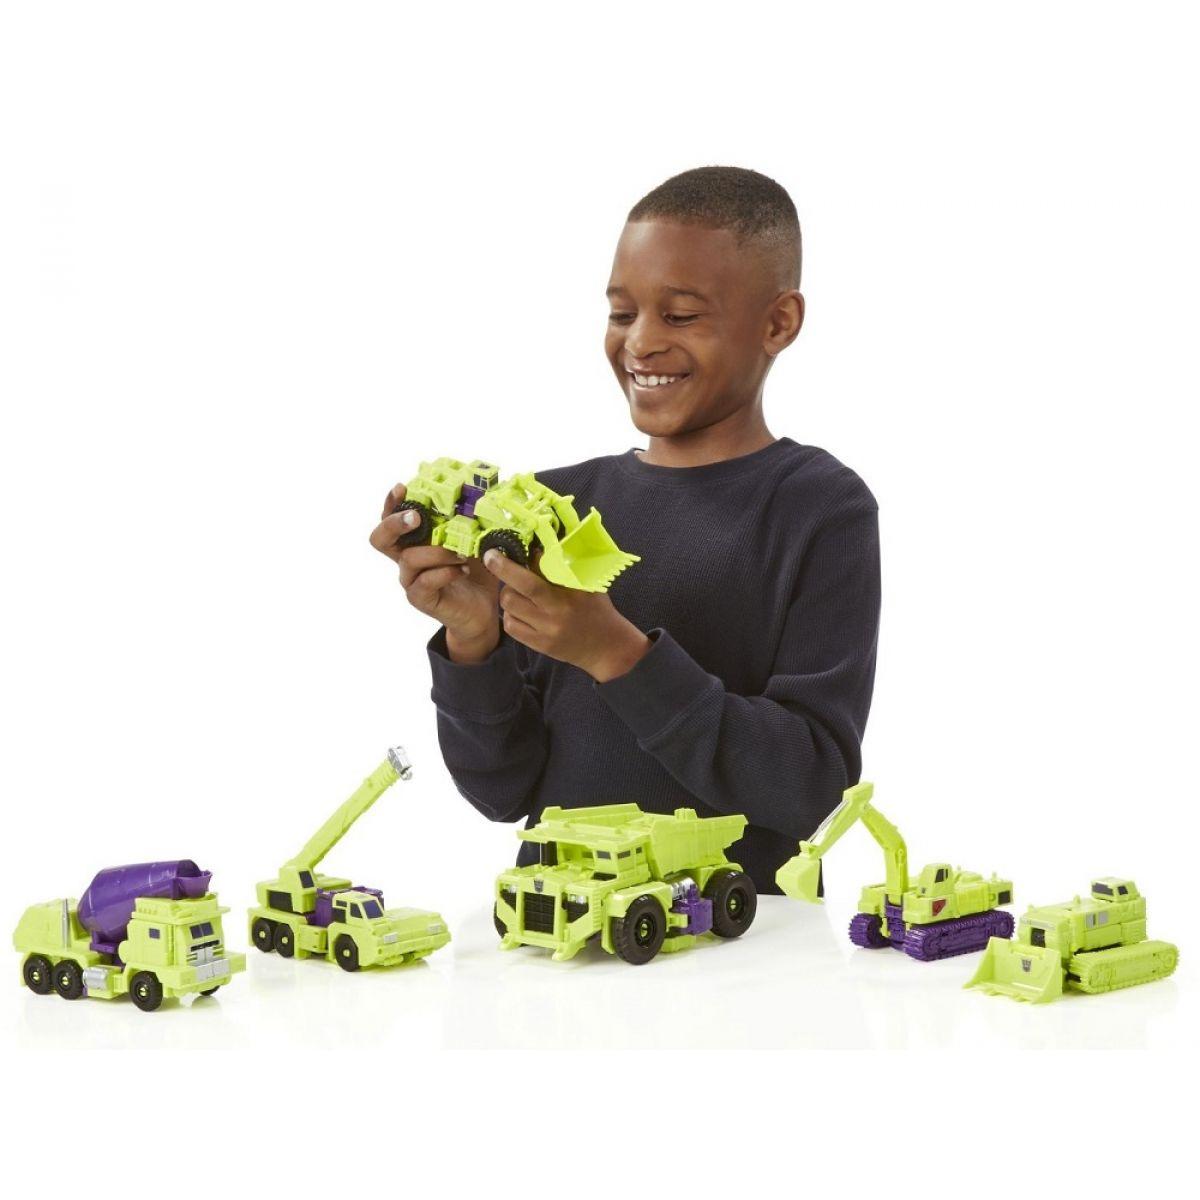 Transformers Generations Devastator 45 cm #7